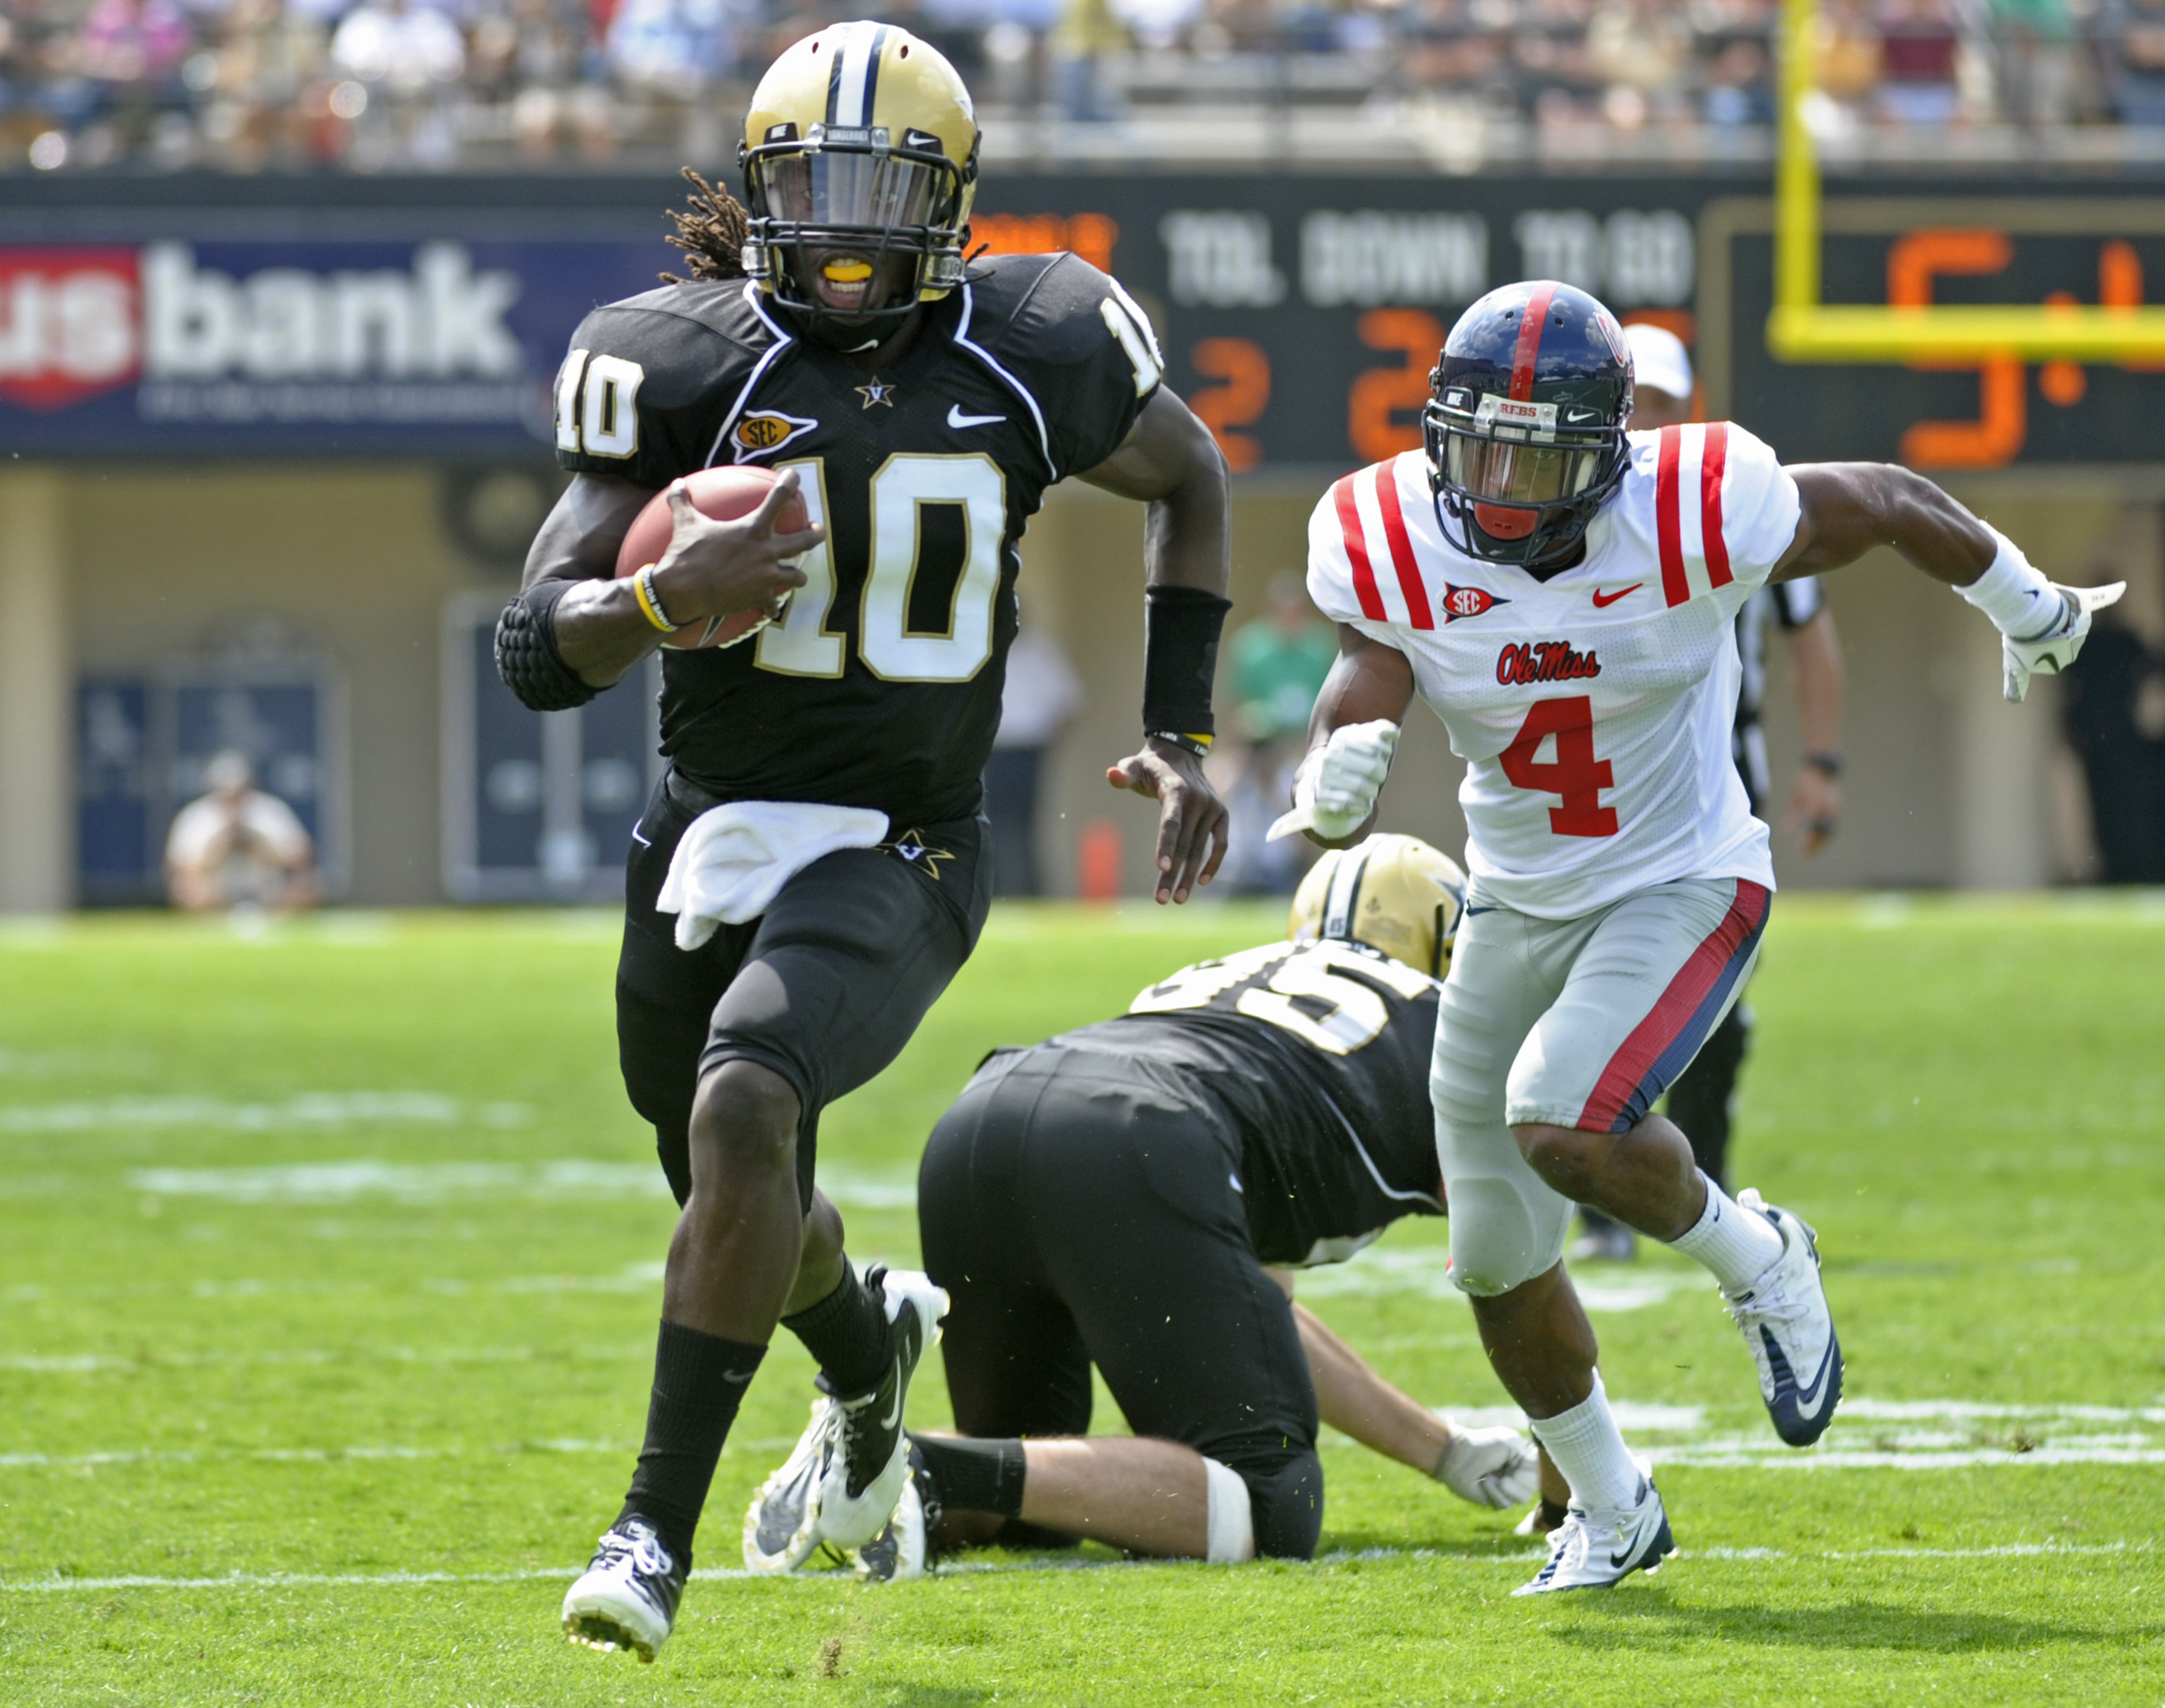 Vanderbilt Football to Announce New Uniforms for 2012 Season